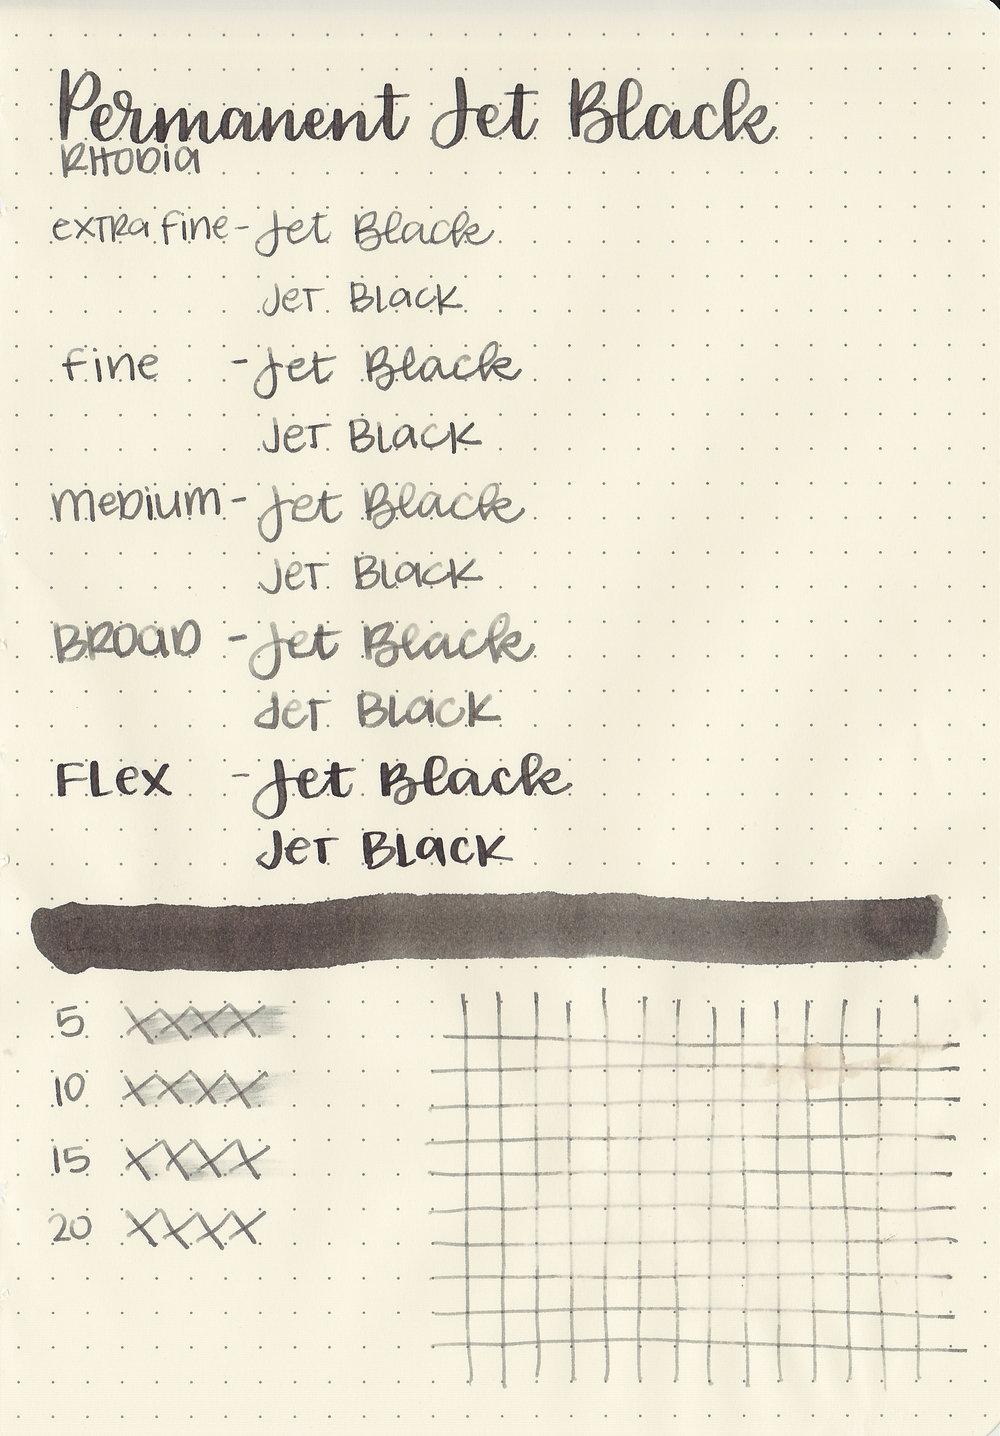 shea-perm-jet-black-5.jpg